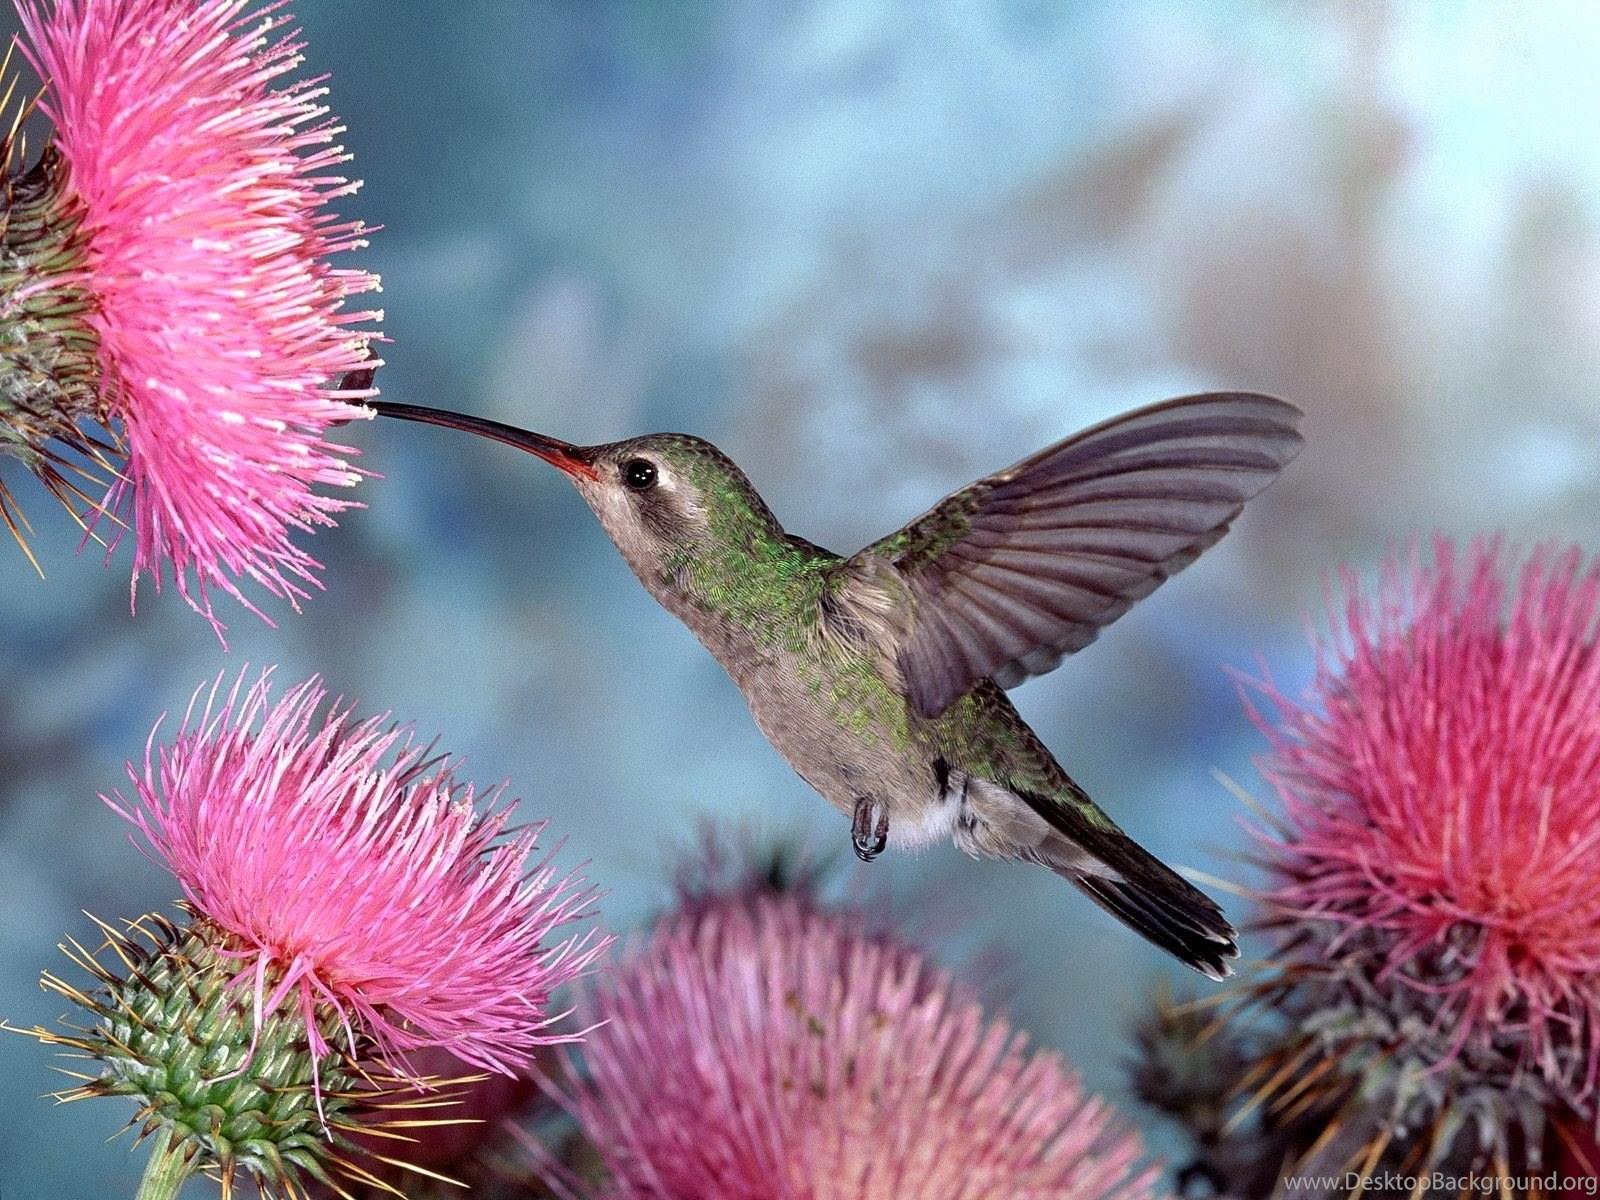 Beautiful Hd Wallpapers - Hummingbird Desktop Background , HD Wallpaper & Backgrounds